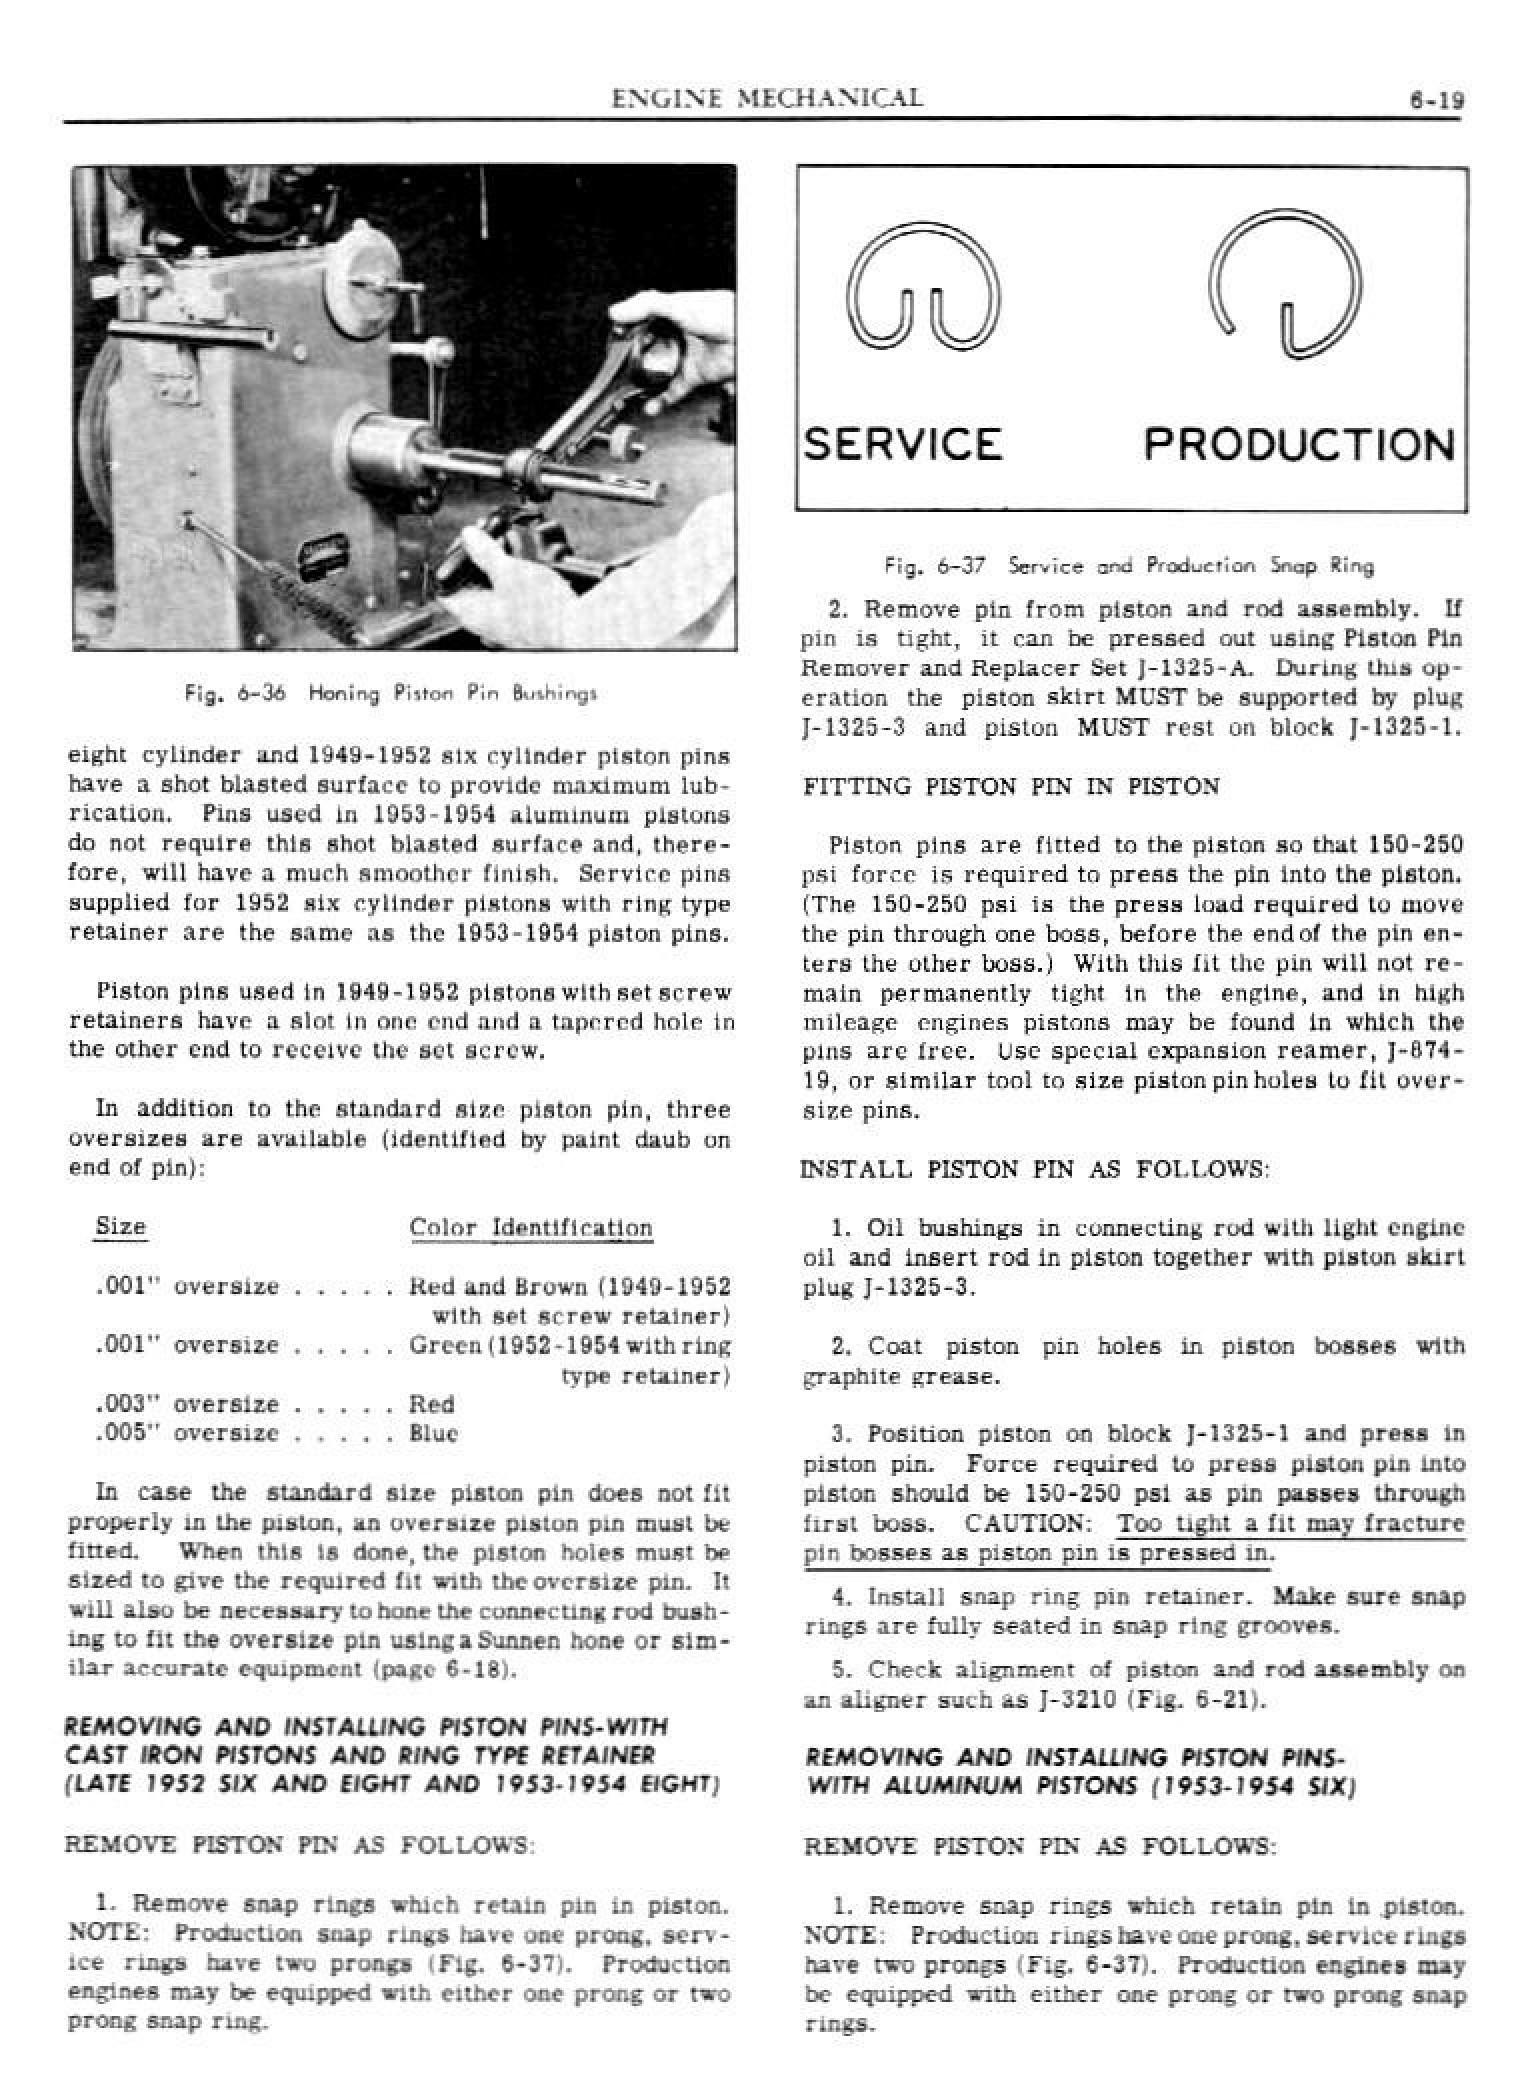 1949 Pontiac Shop Manual- Engine Mechanical Page 19 of 26